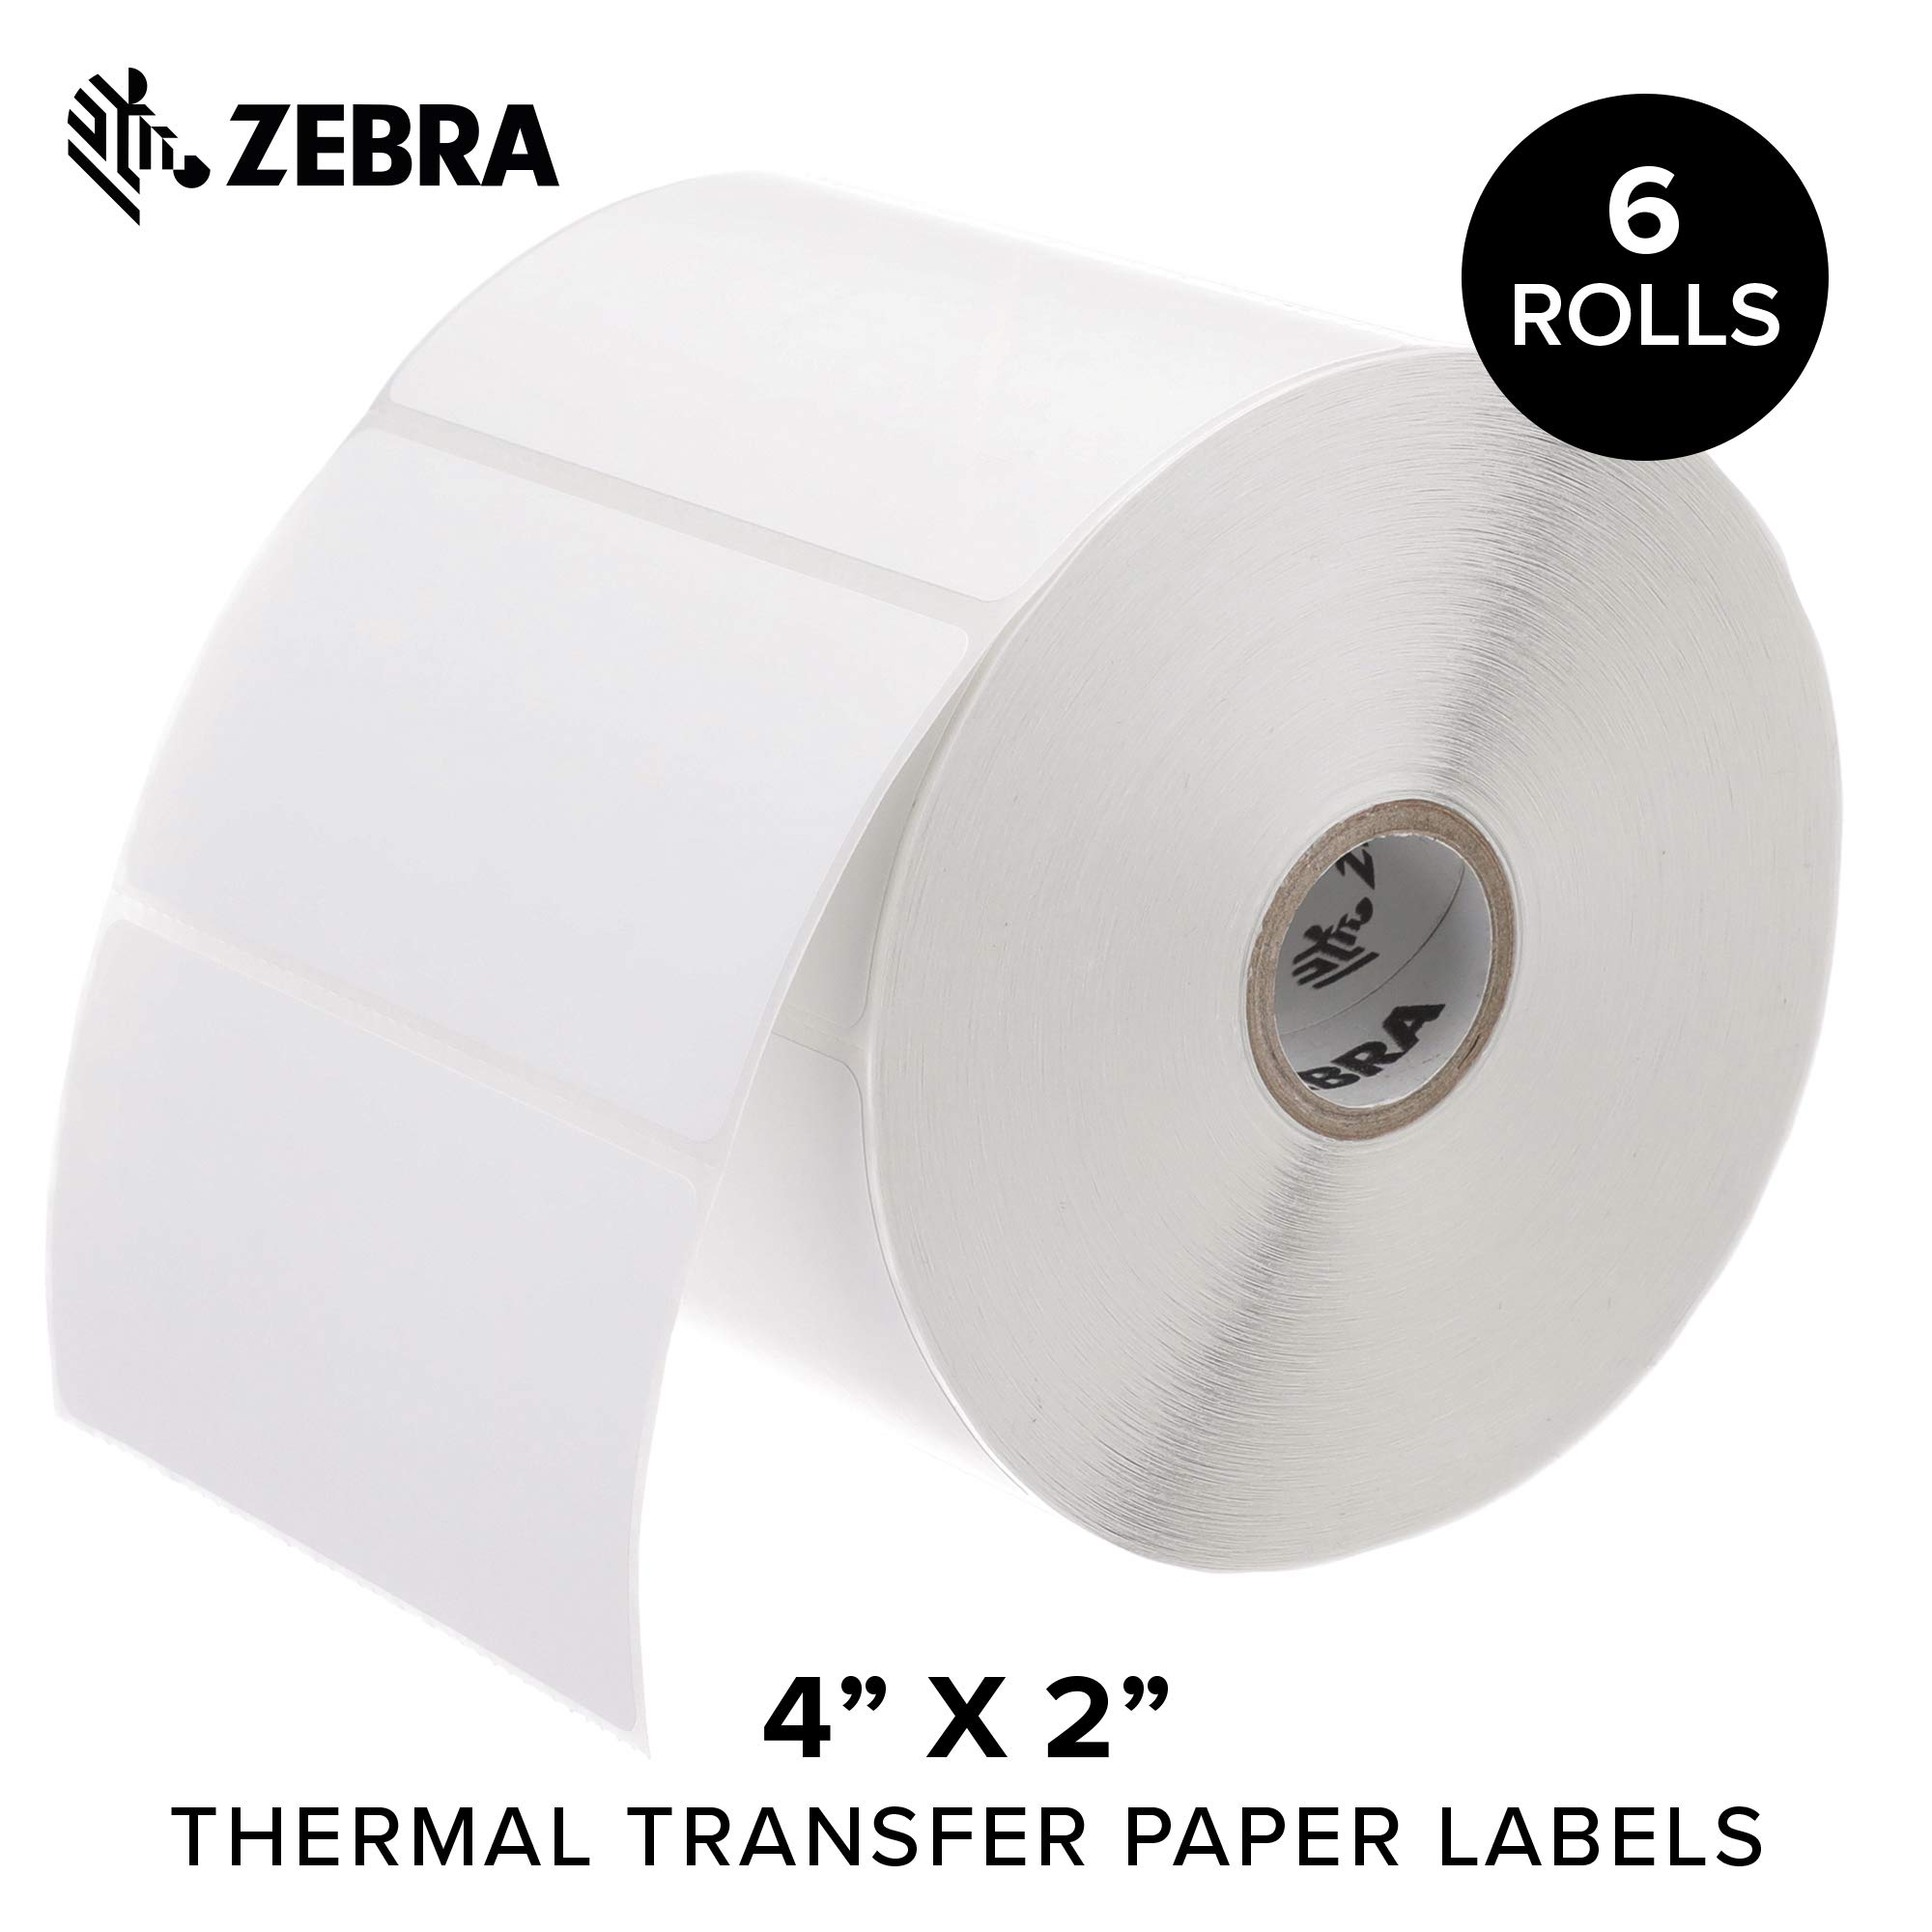 Zebra - 4 x 2 in Thermal Transfer Paper Labels, Z-Perform 2000T Permanent Adhesive Shipping Labels, Zebra Desktop Printer Compatible, 1 in Core - 6 Rolls by ZEBRA